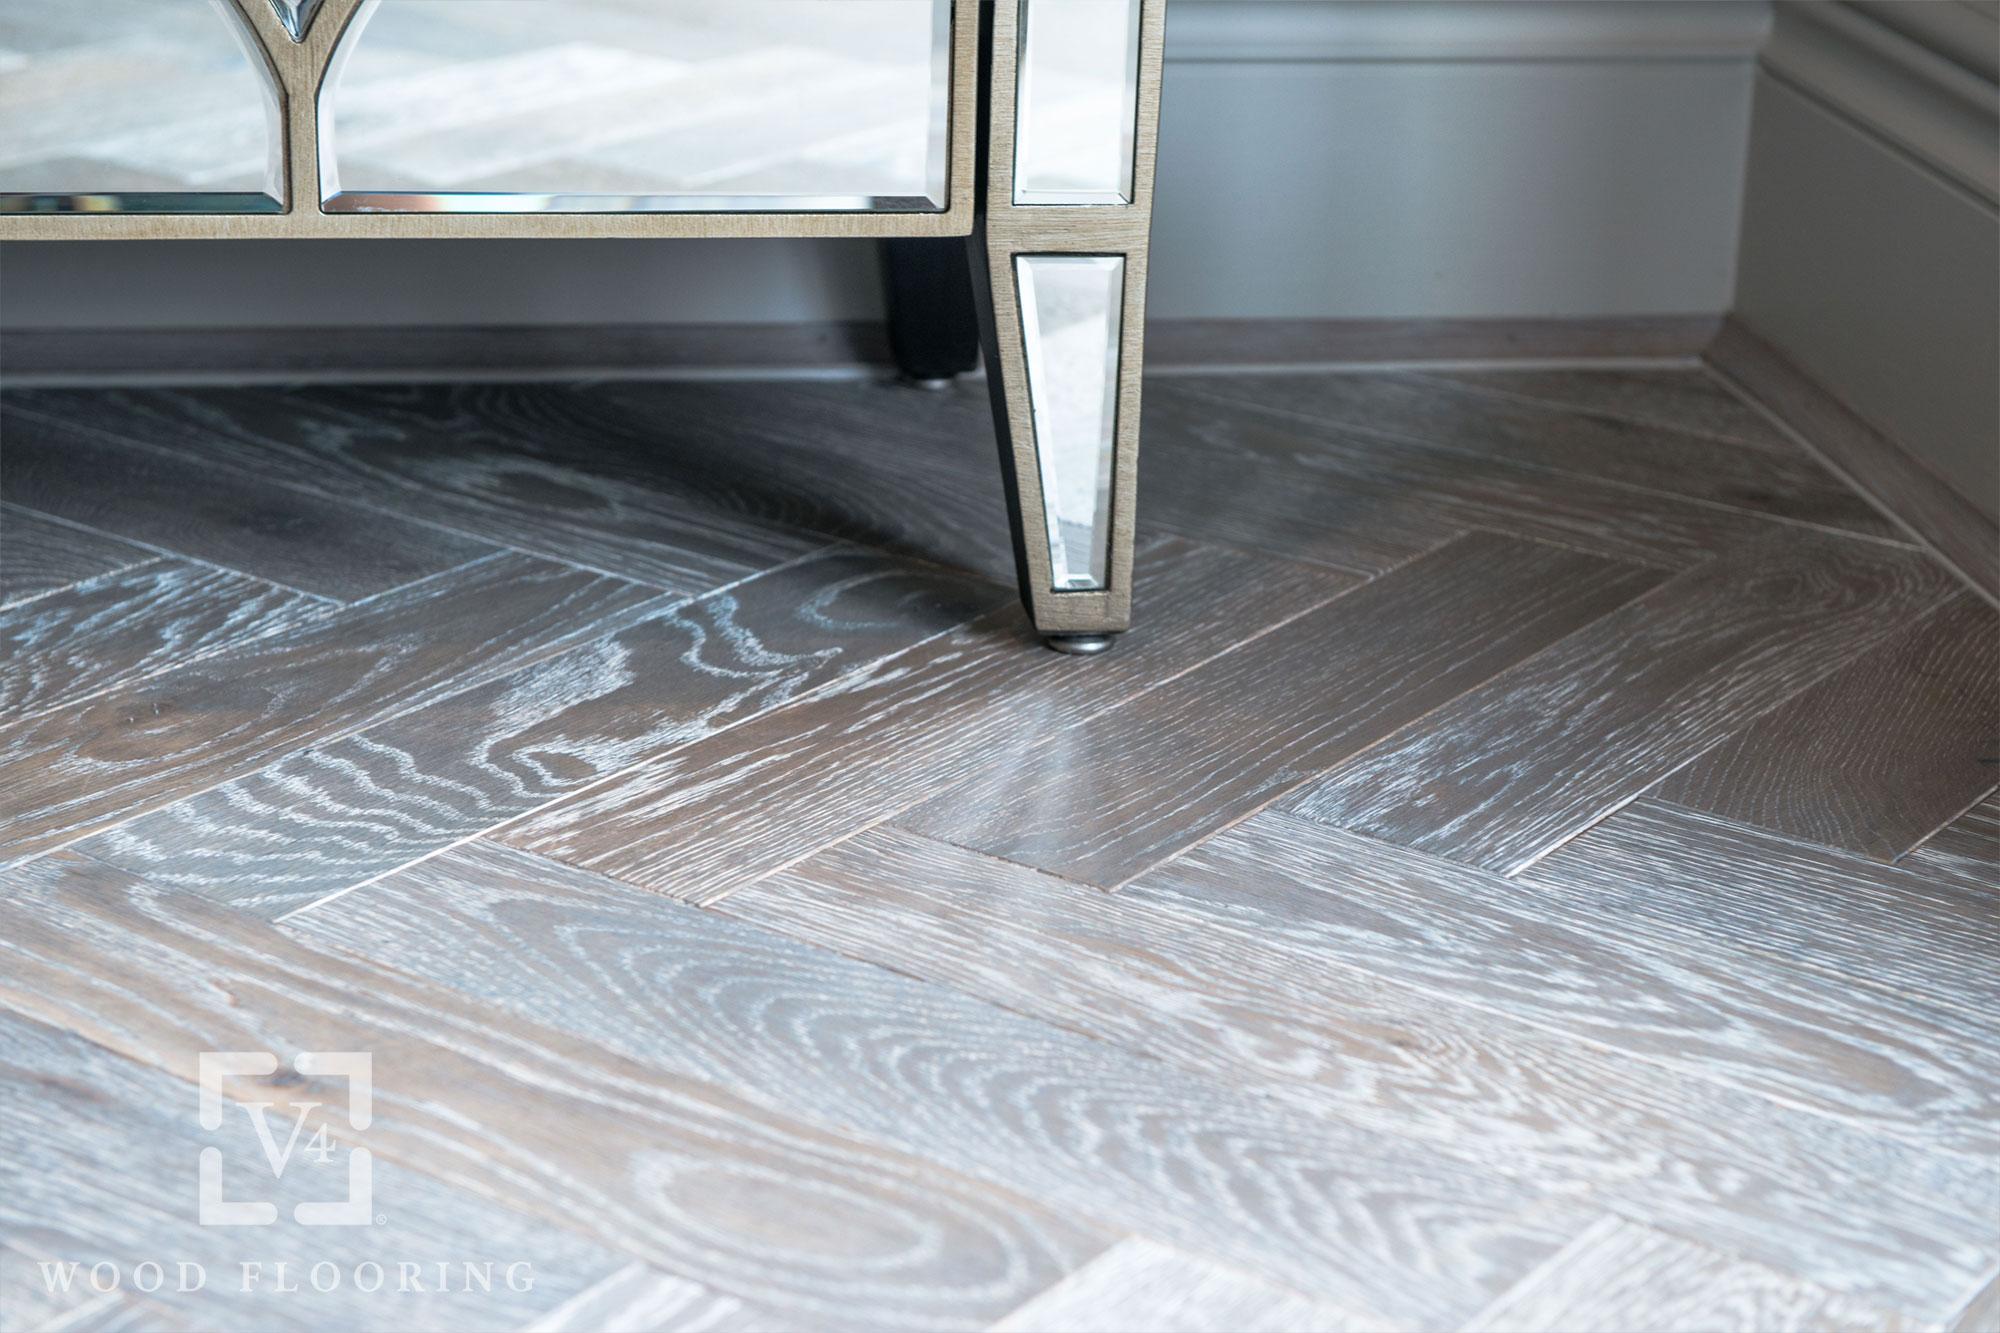 V4 London Wood Flooring Zigzag Zb103